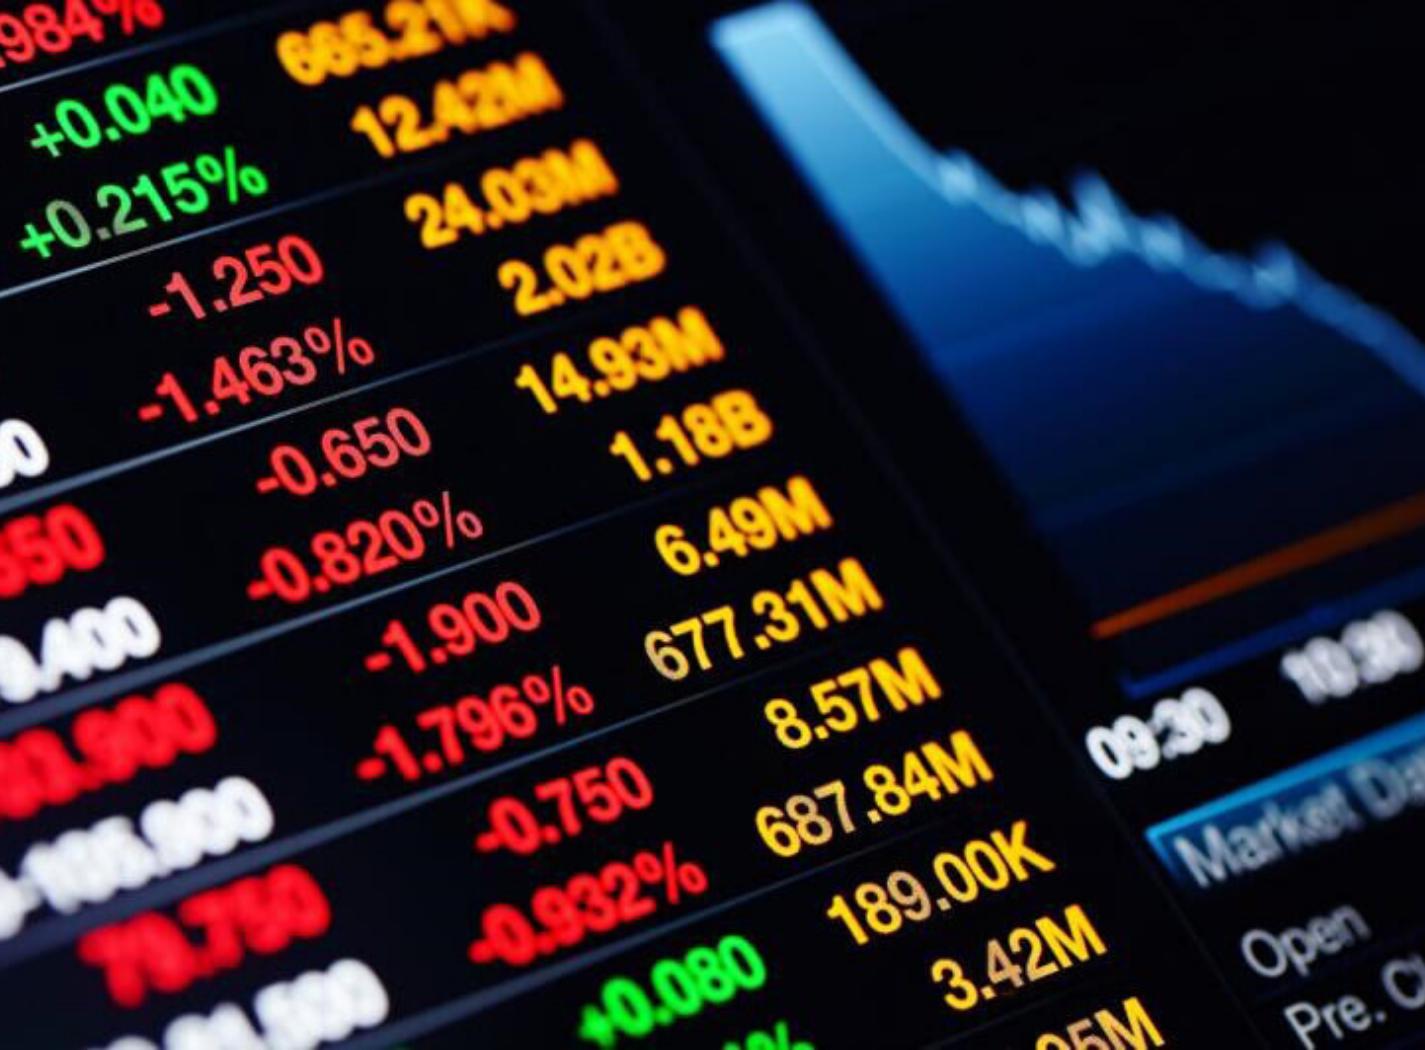 Despite a dip in the market, portfolios remain positive Thumbnail